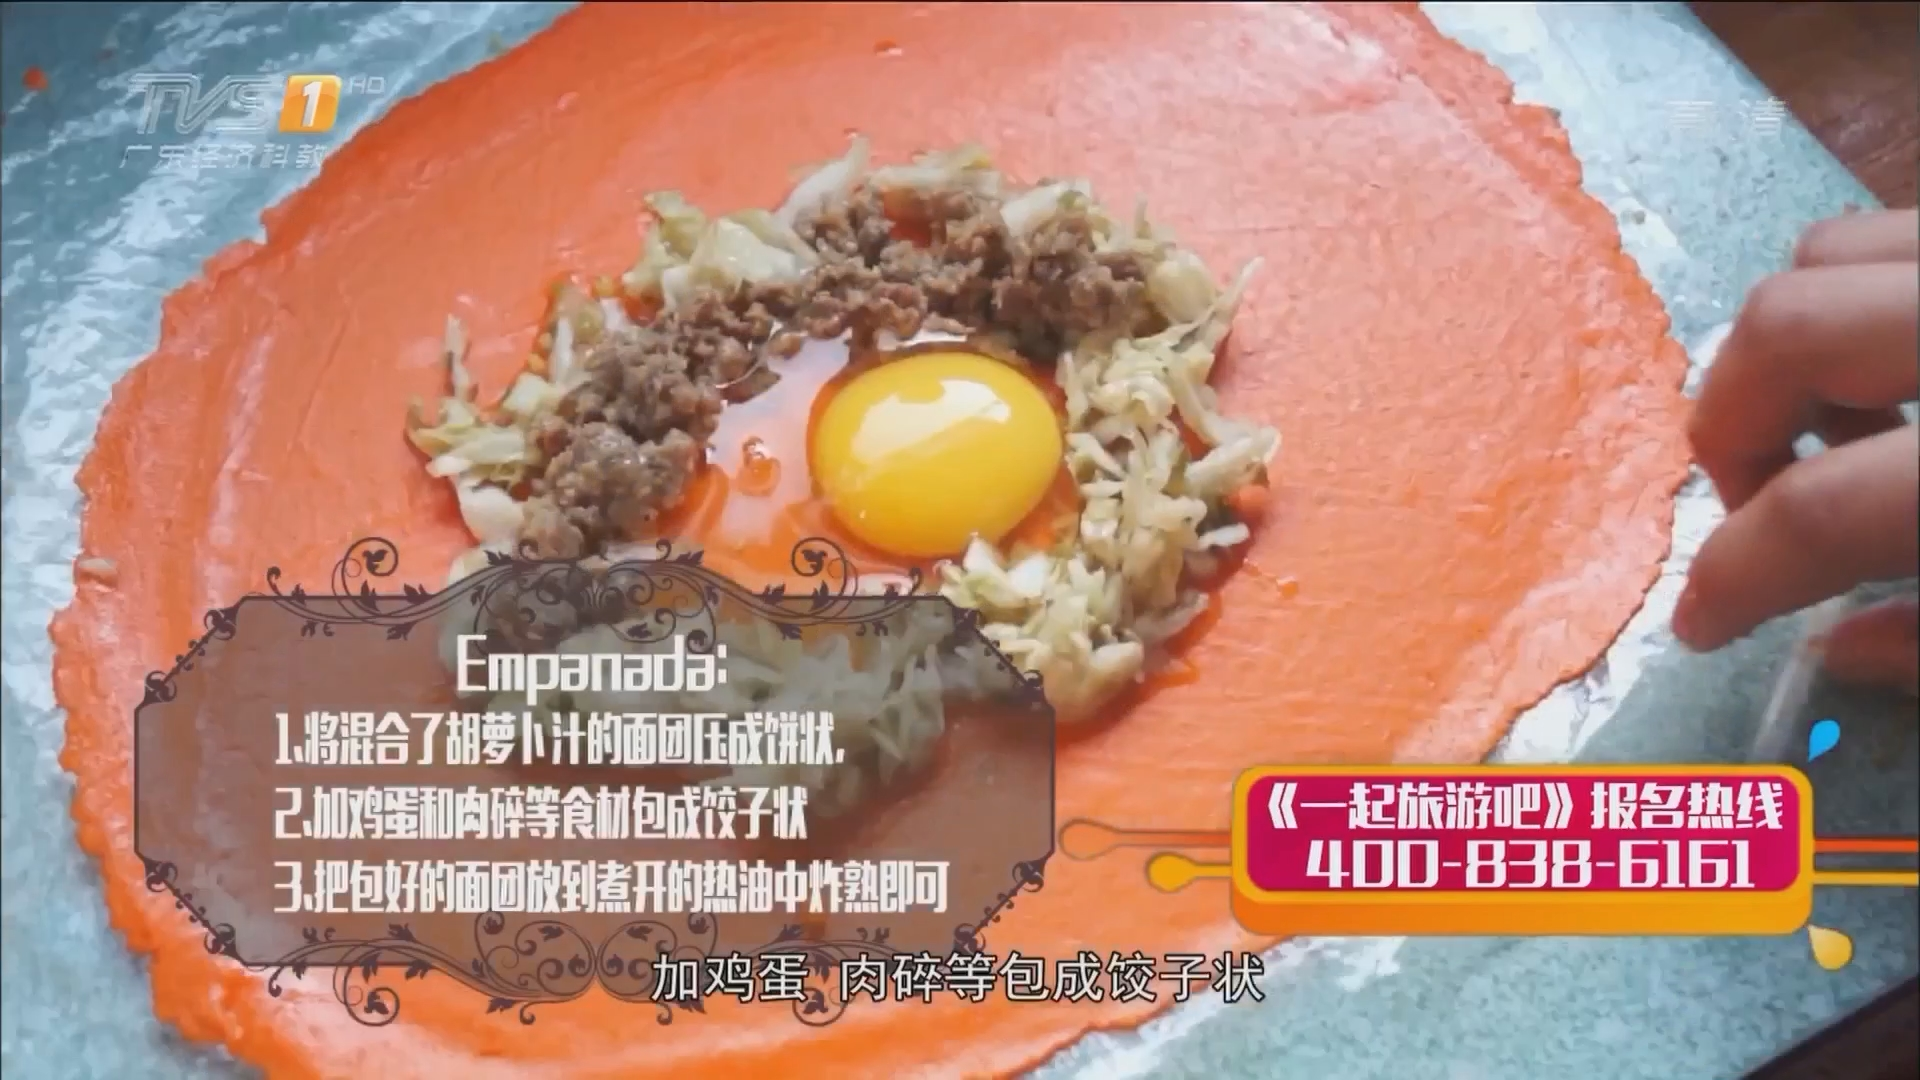 菲律宾——拉瓦格美食Empanada